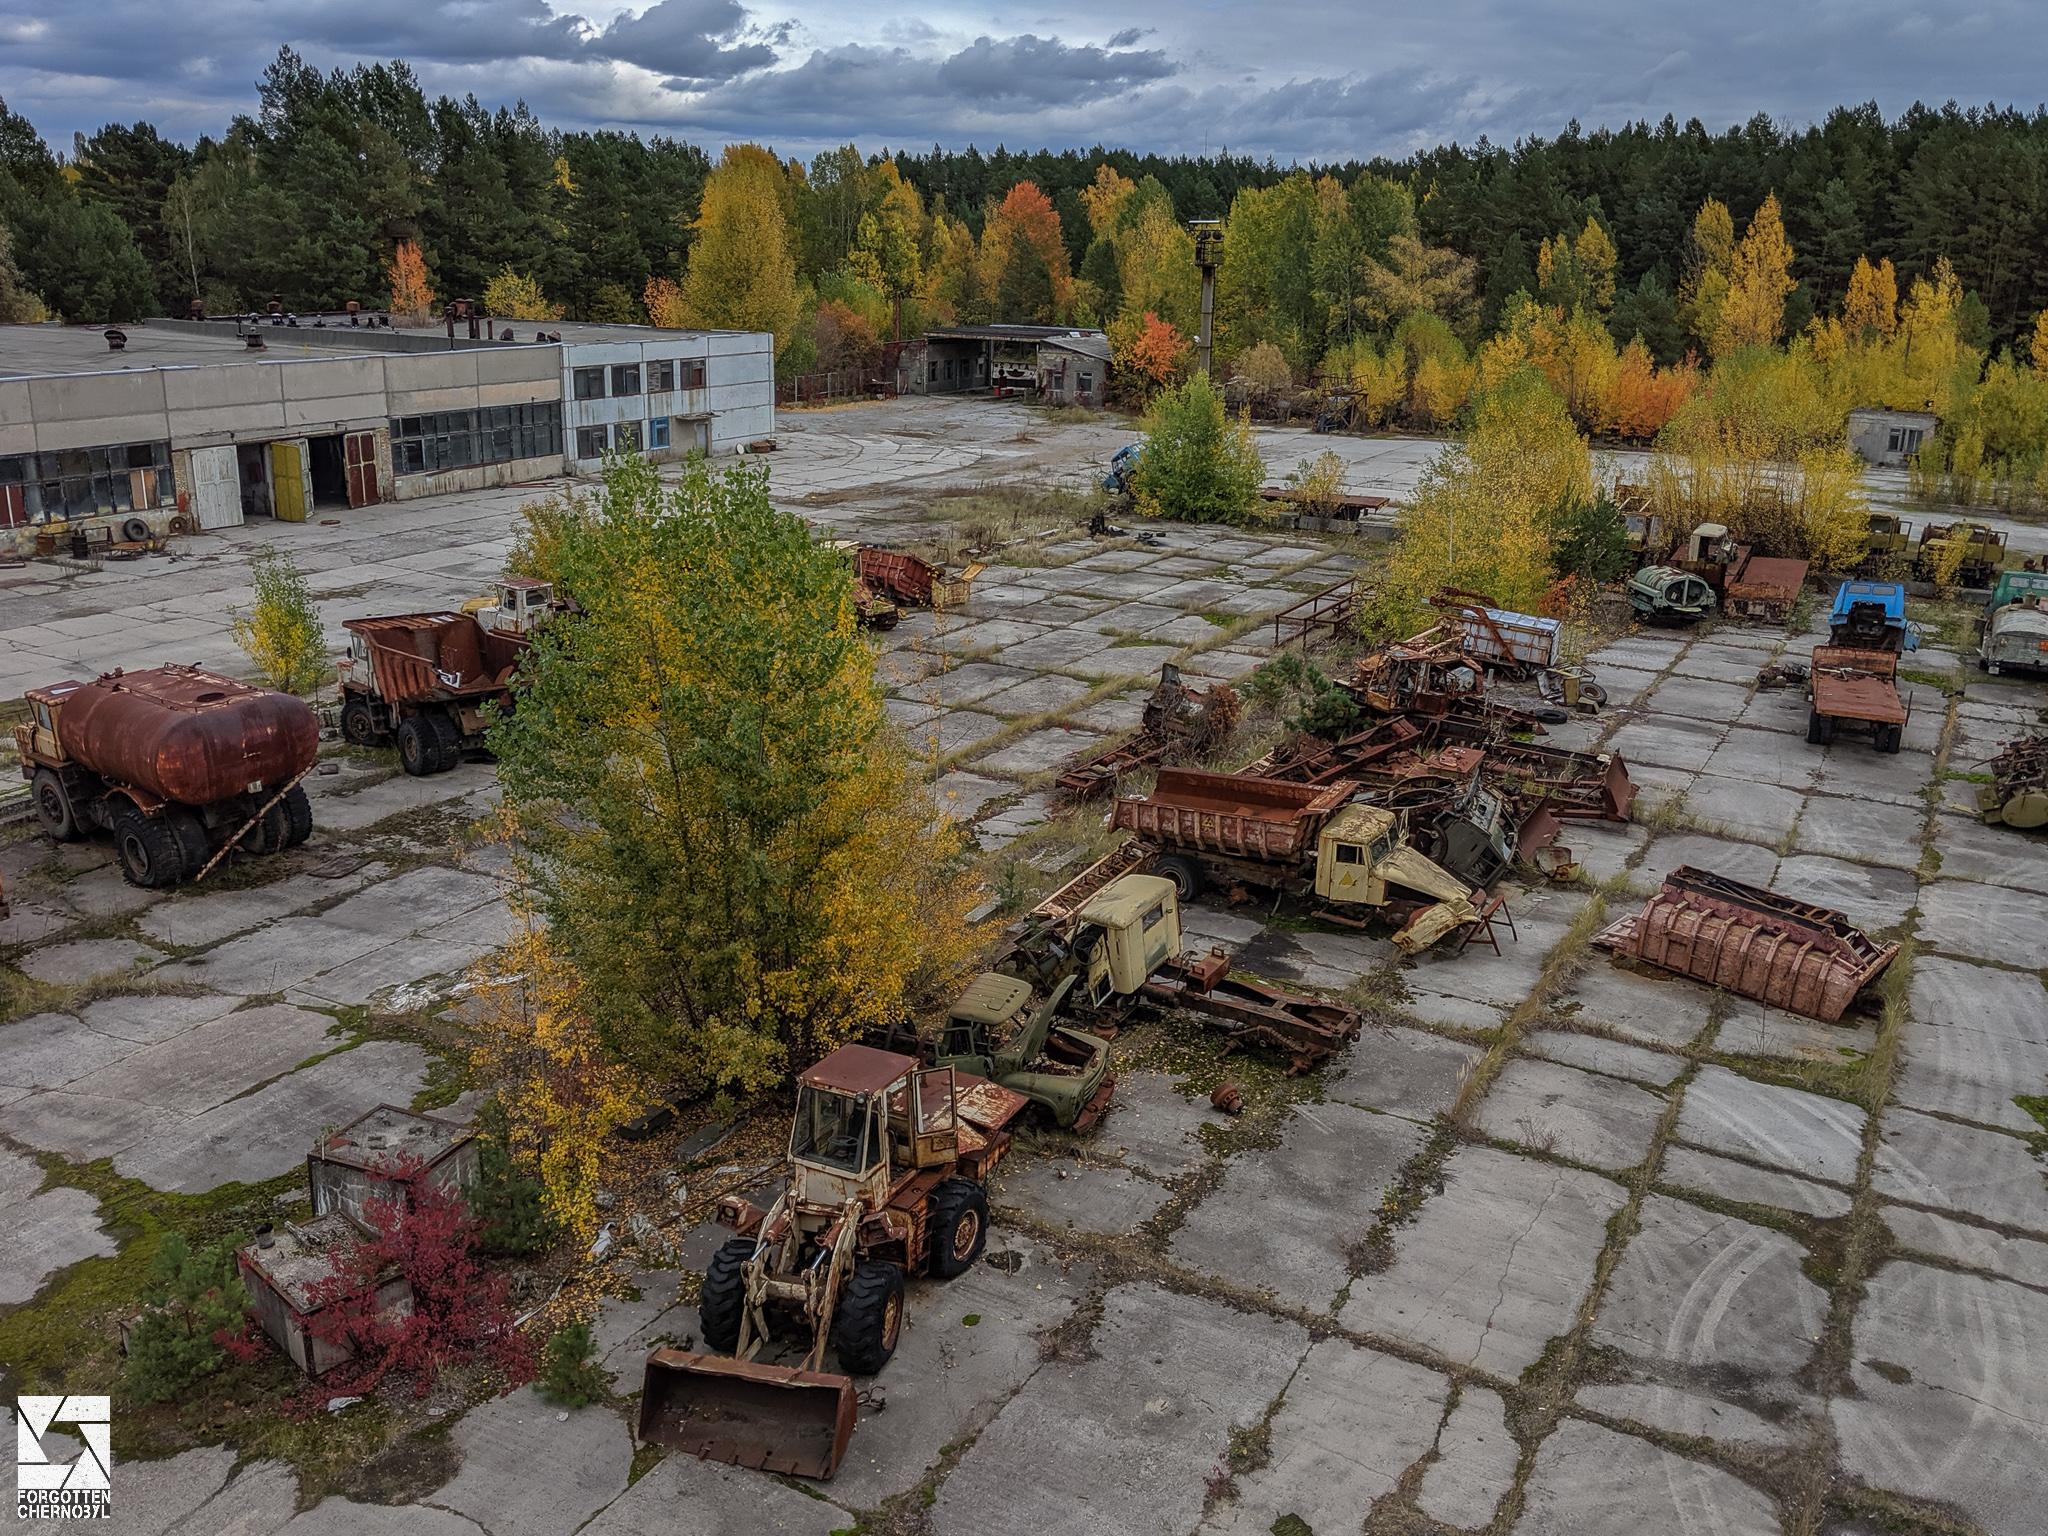 ATH 2 (ATX 2) garage and repair facility near Pripyat